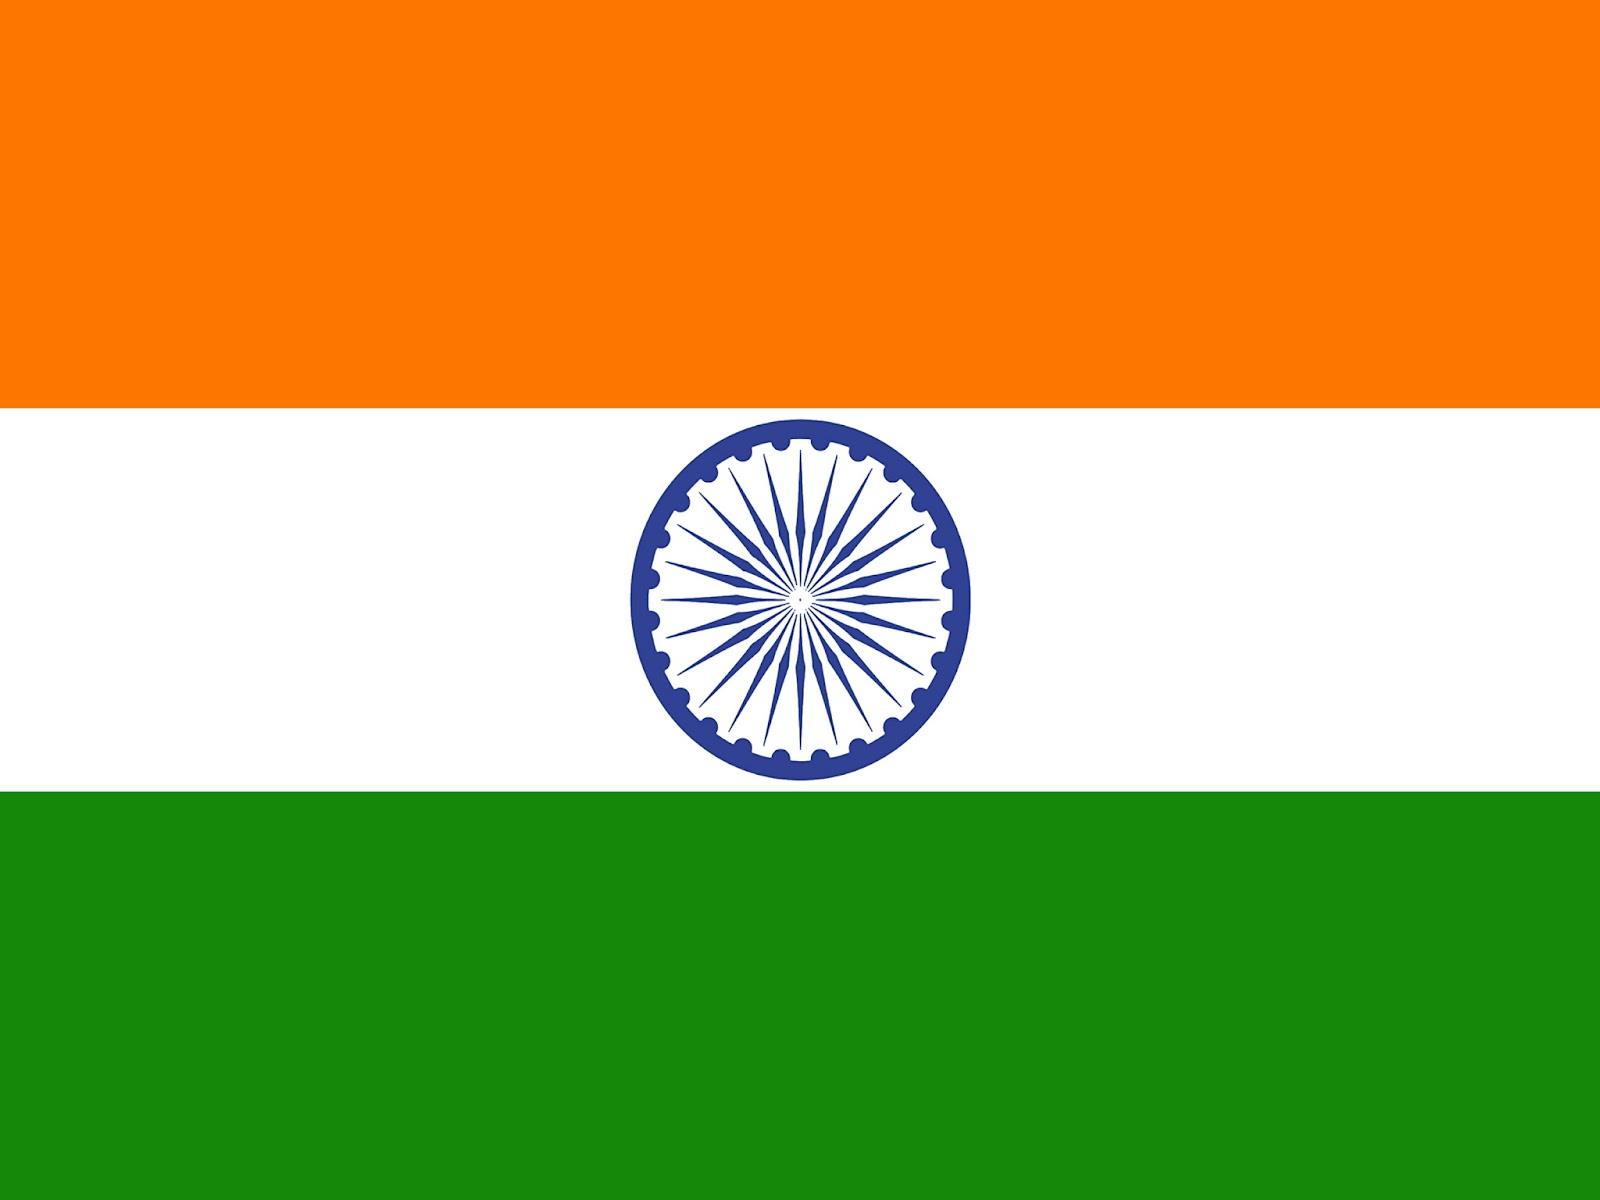 Indian Flag Wallpaper: India Flag Wallpaper